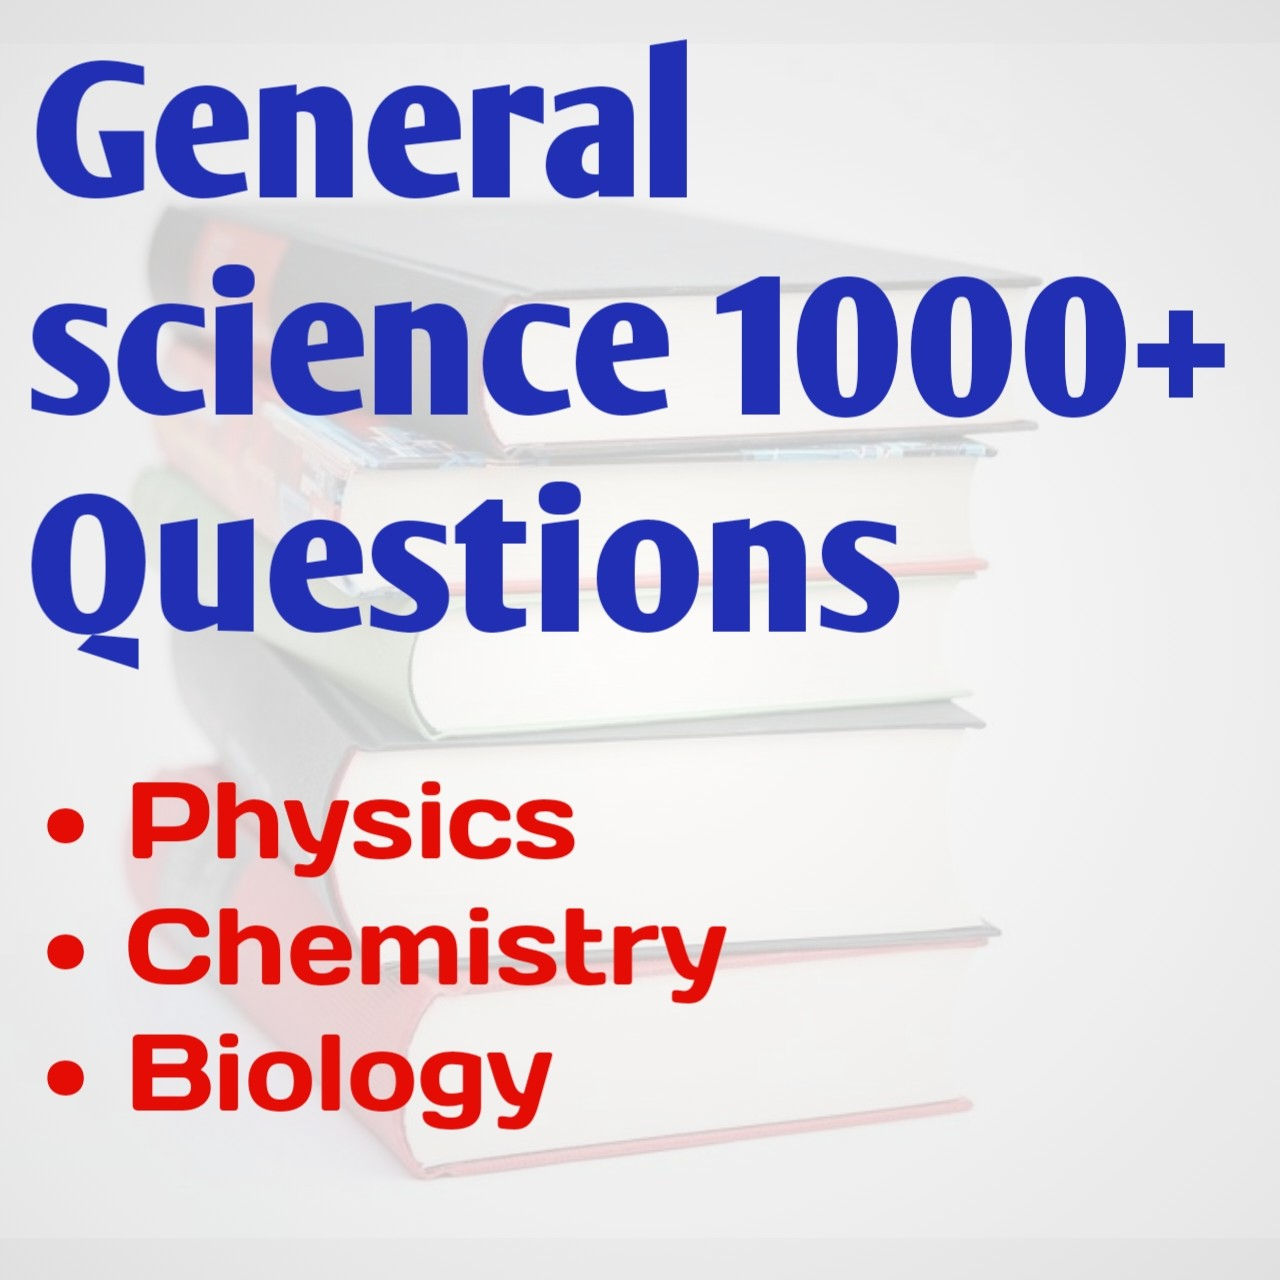 सामान्य विज्ञान 1000 महत्वपूर्ण प्रश्न |